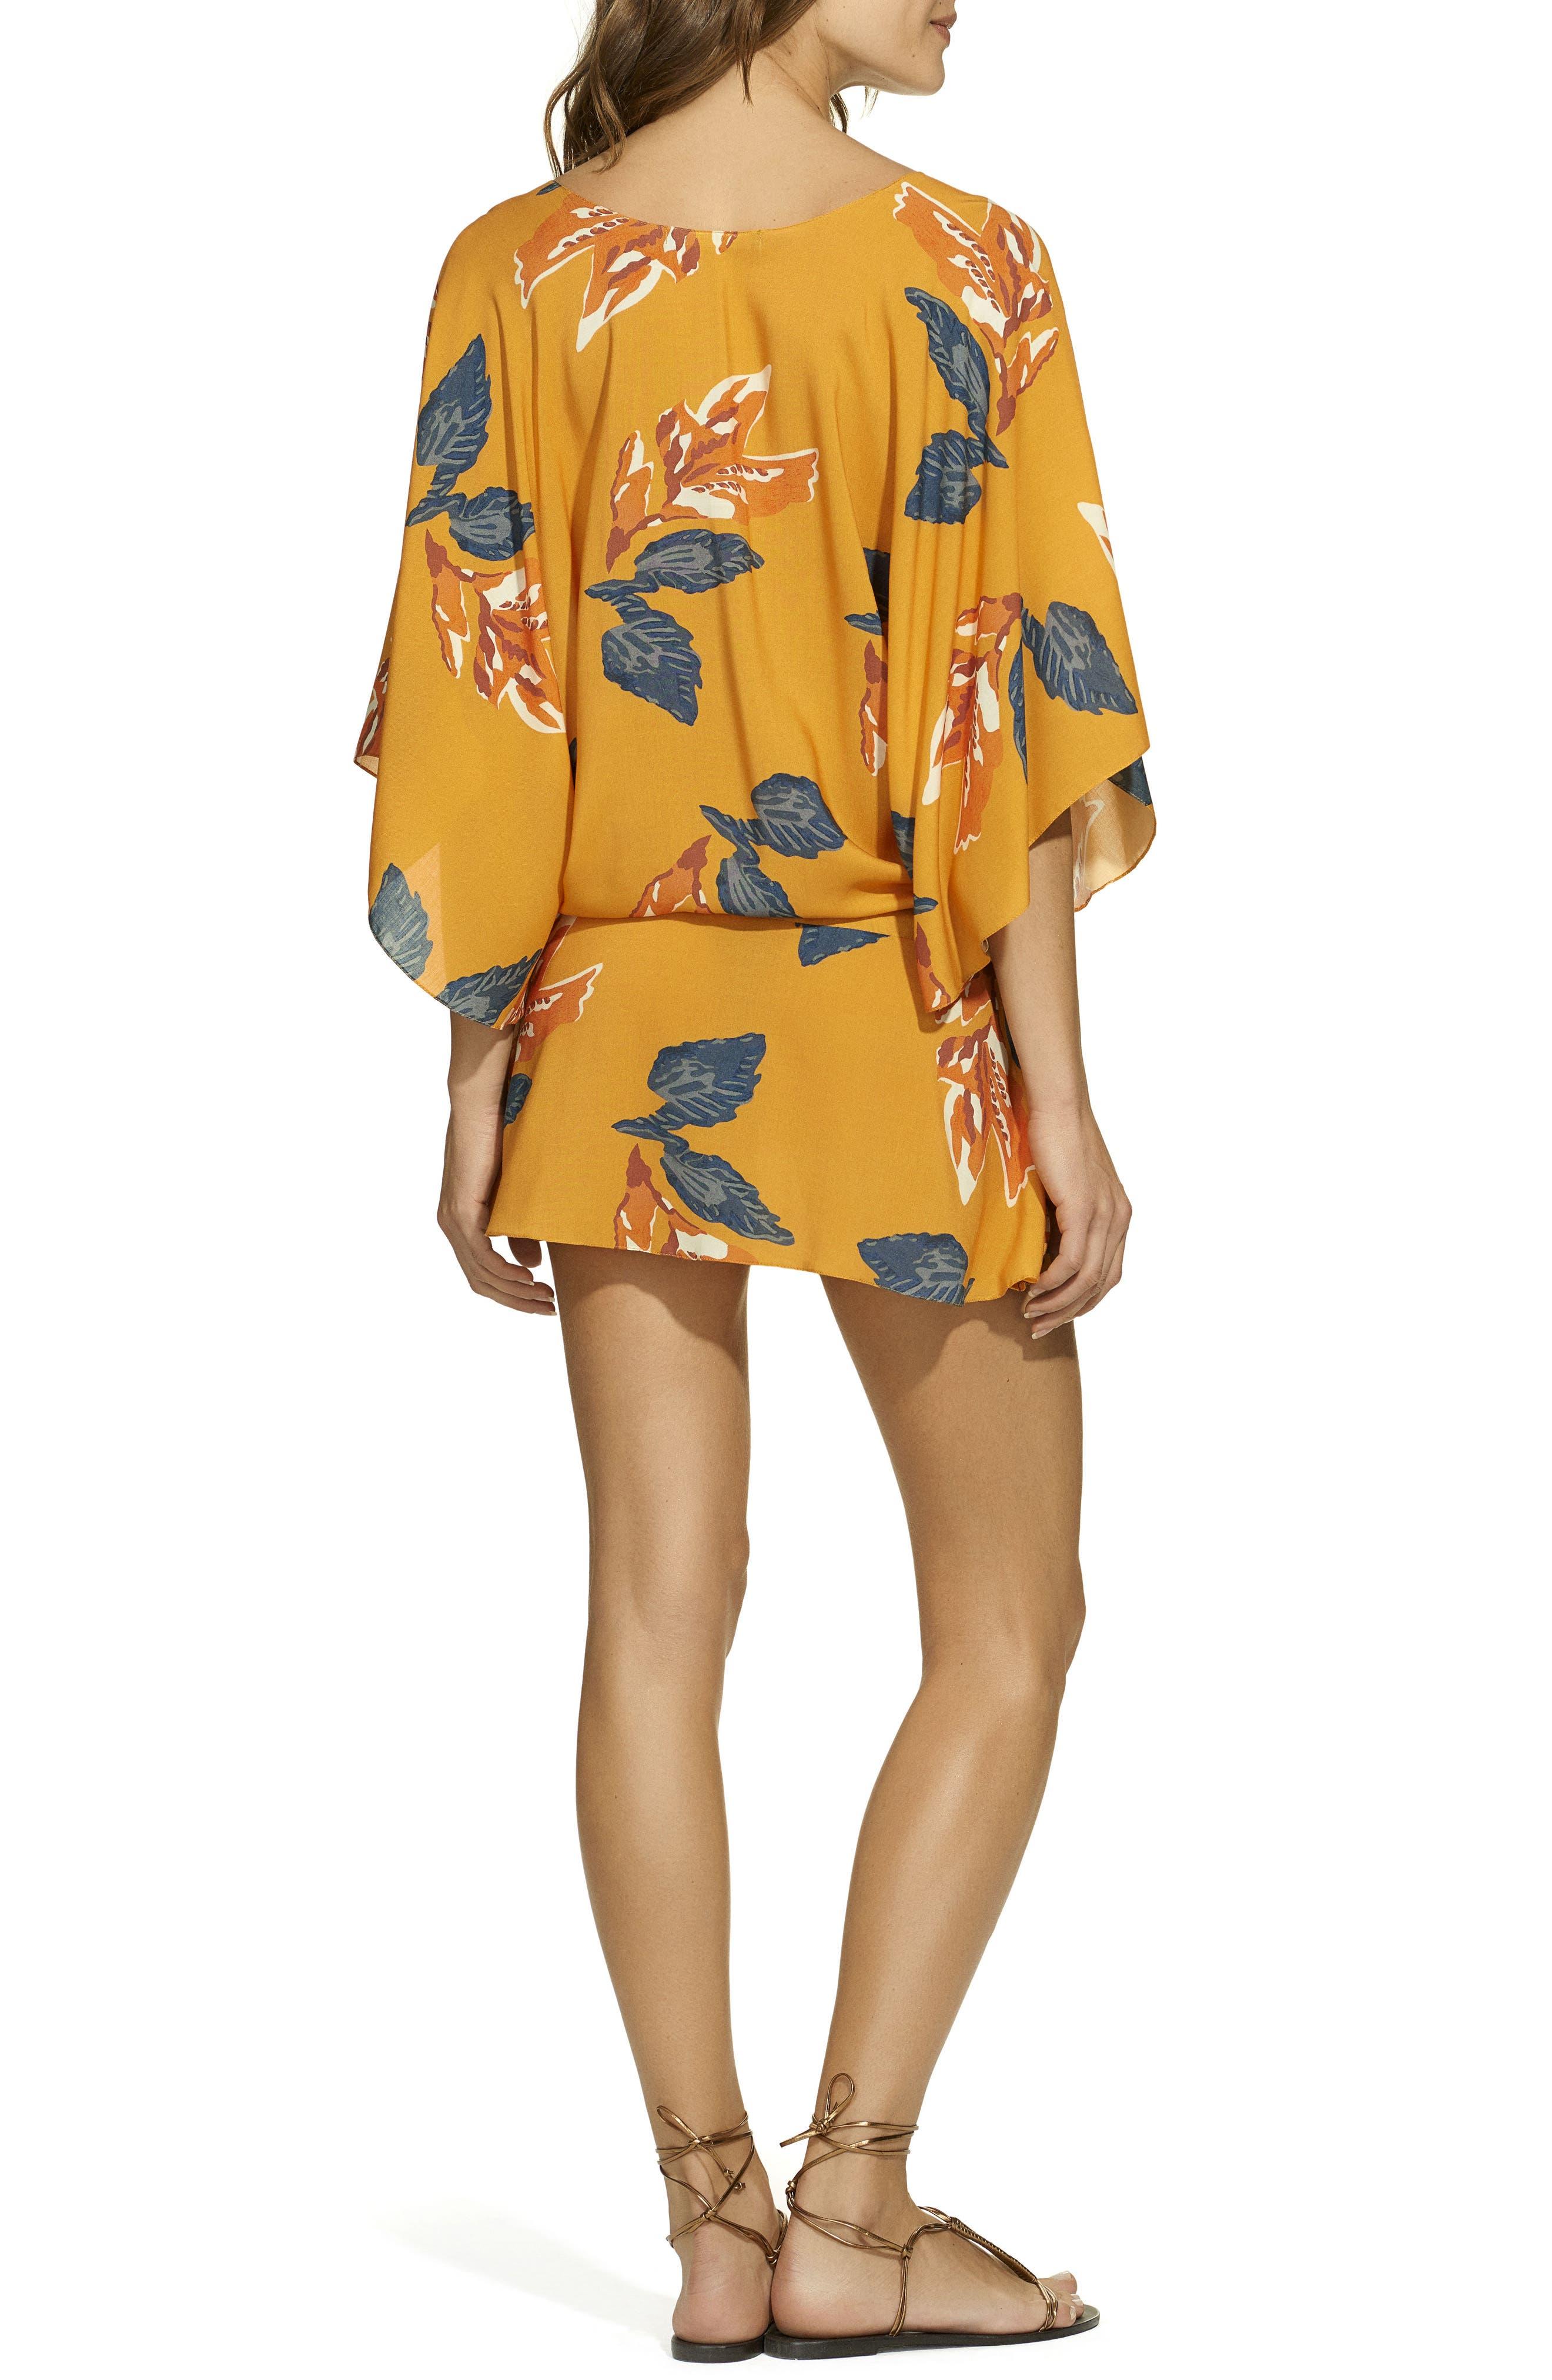 Tulum Vintage Cover-Up Tunic,                             Alternate thumbnail 2, color,                             Orange Multi